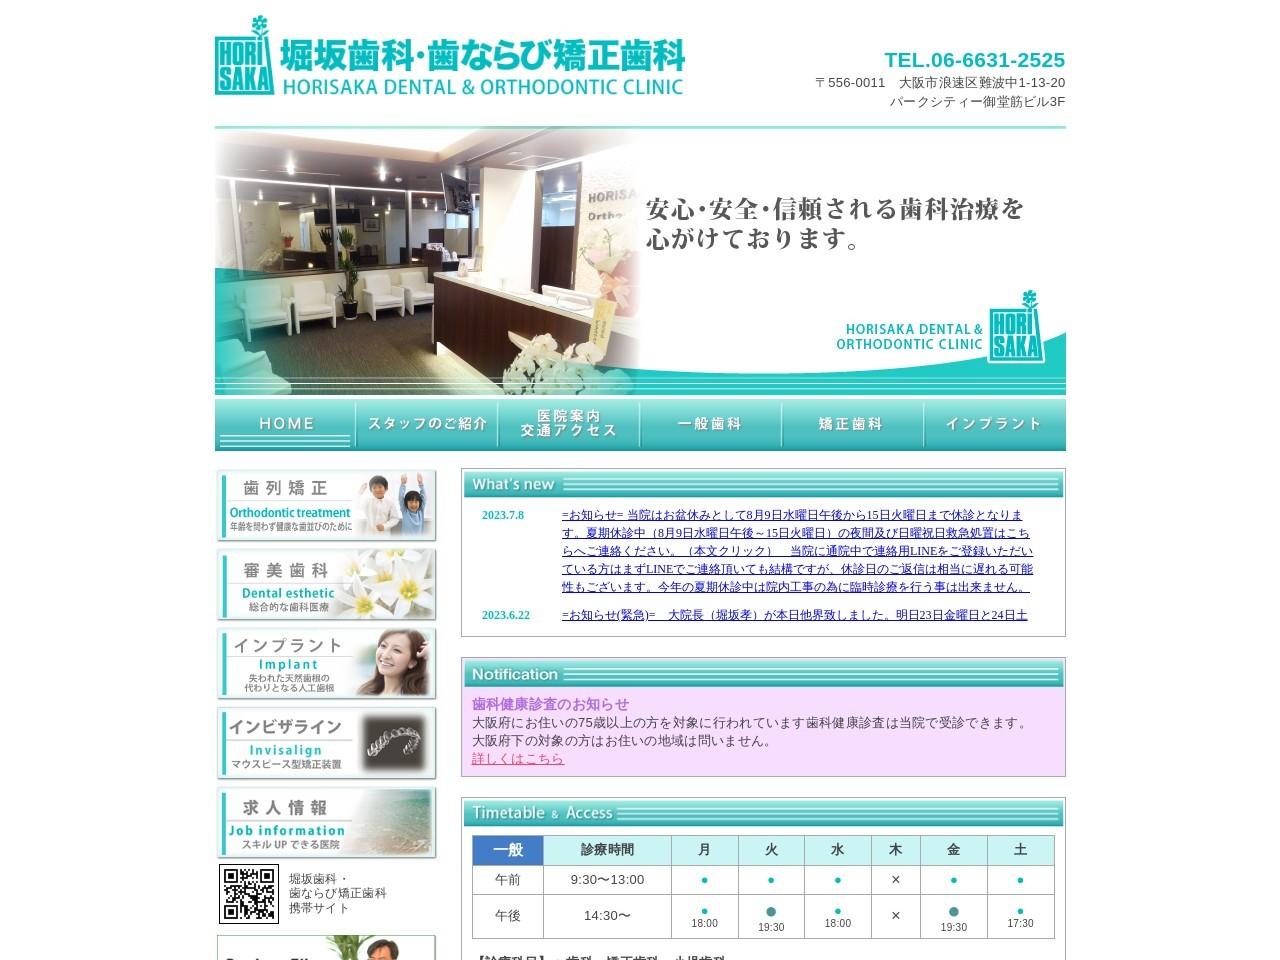 堀坂歯科・歯ならび矯正歯科 (大阪府大阪市浪速区)